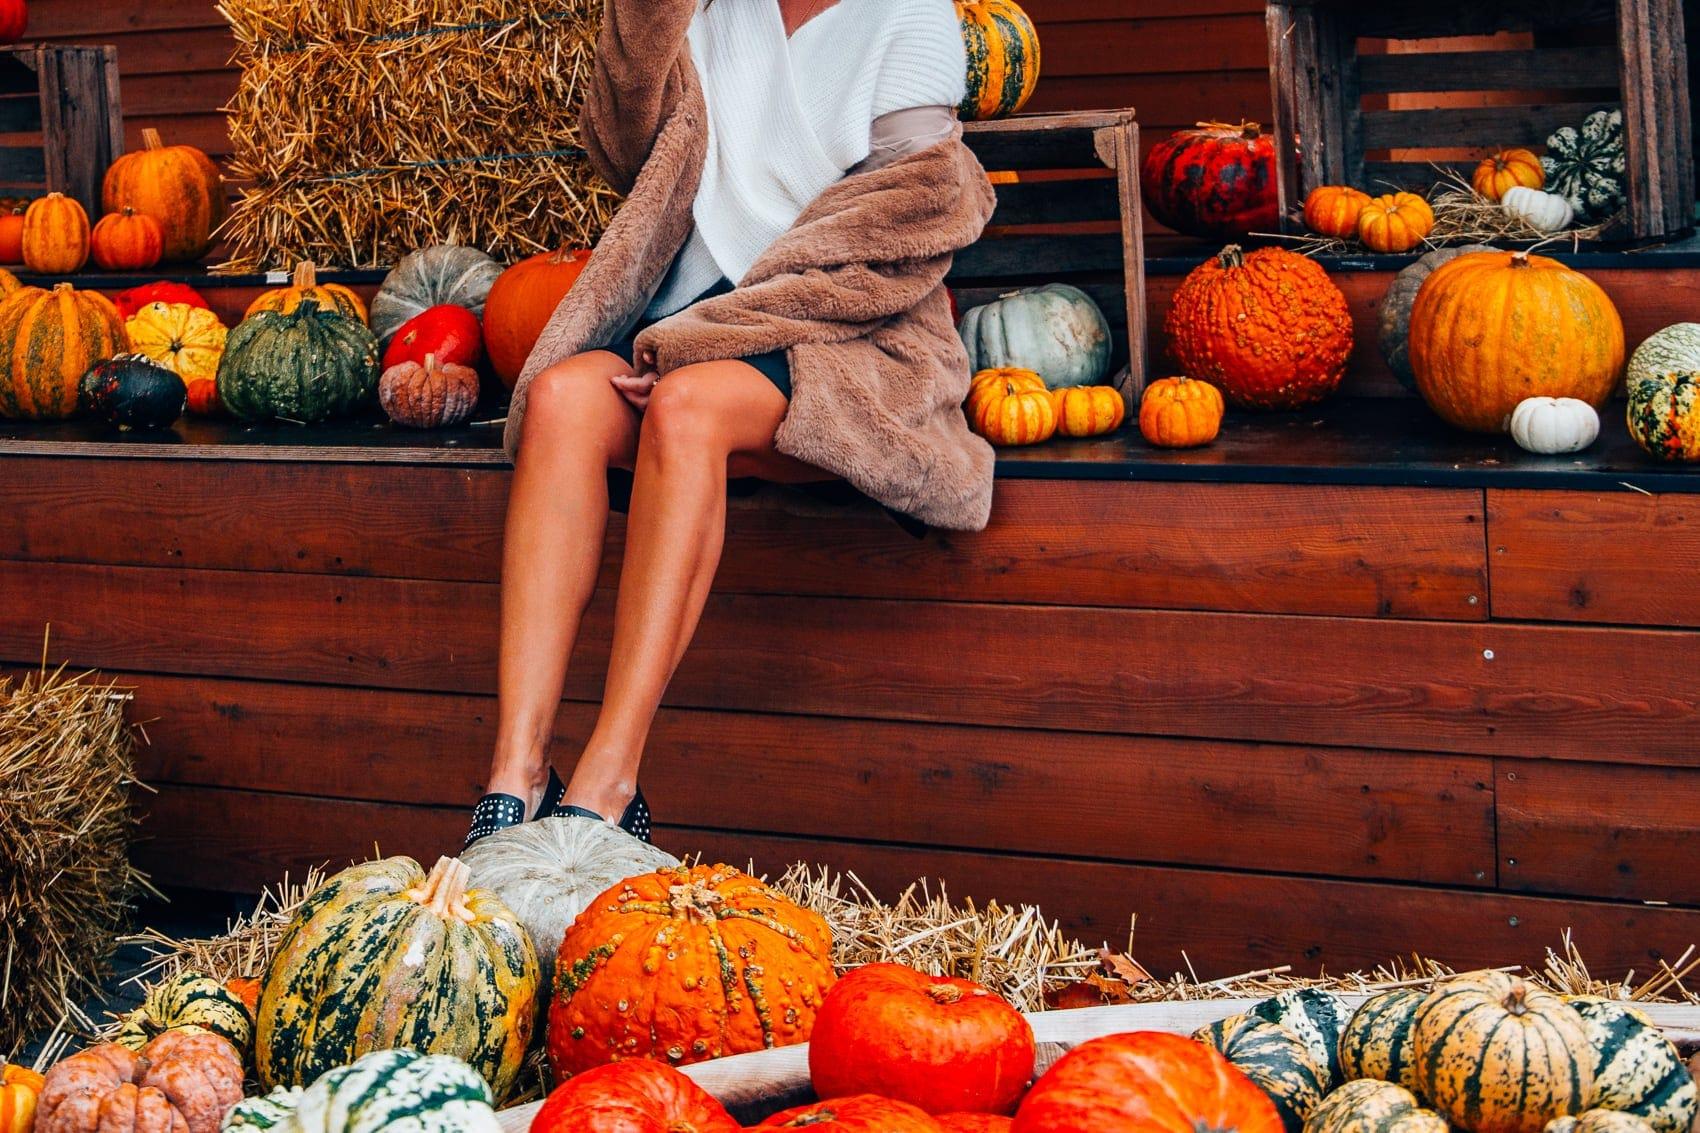 Herbst Trends 2018: Bakerboy Mütze, Teddy Mantel, Off-Shoulder Pullover - Outfit Inspiration auf dem Gertrudenhof in Köln